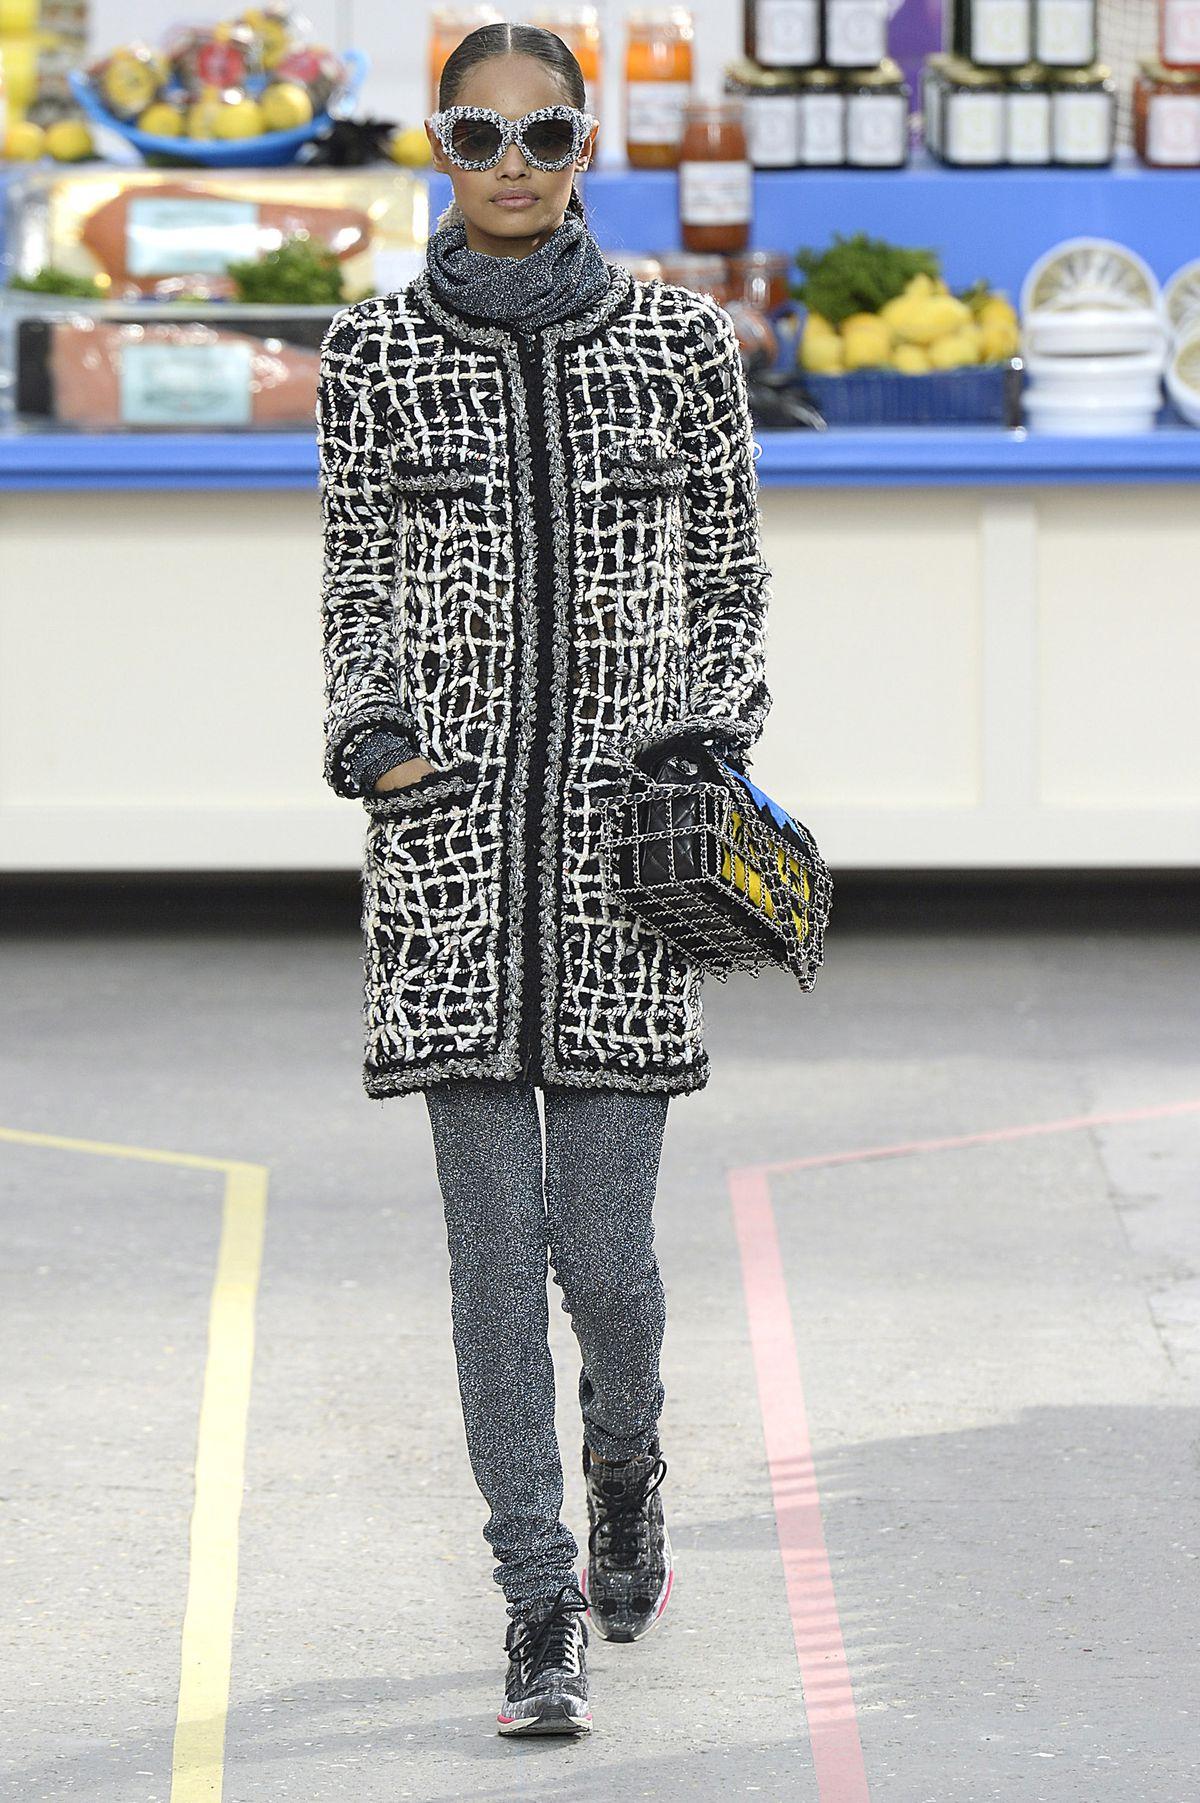 01d567449f5 Karl Lagerfeld dead at 85  the Chanel designer revolutionized ...